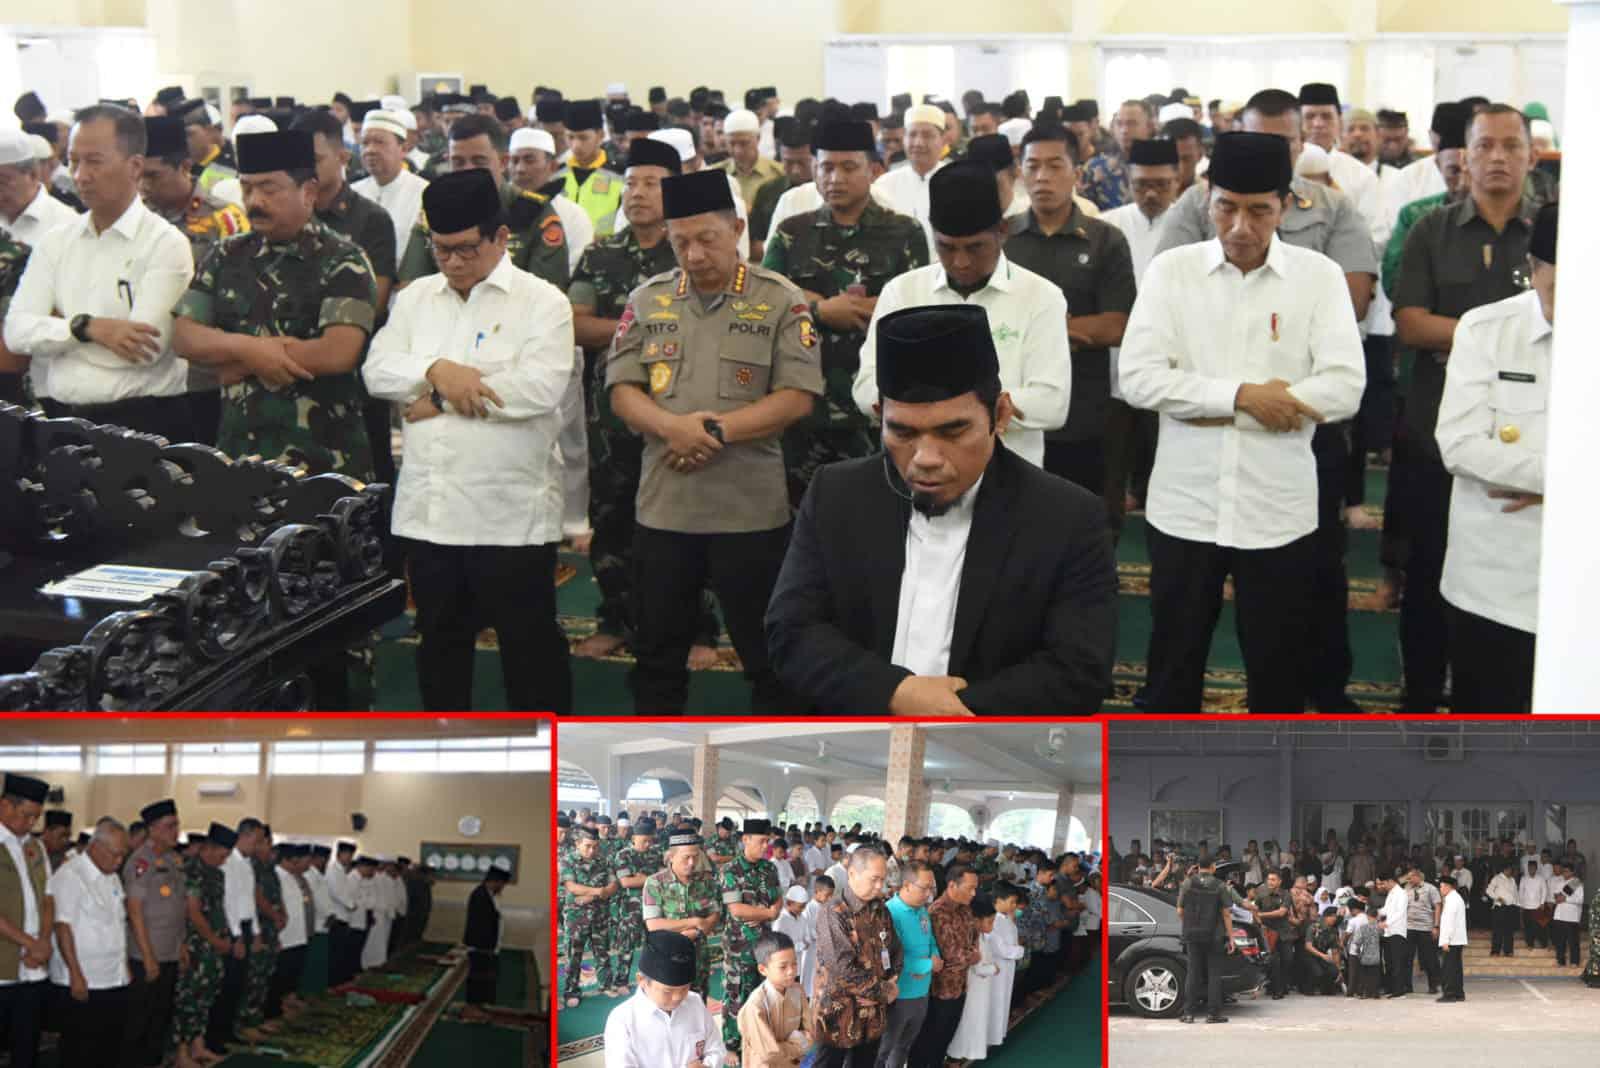 Presiden RI Shalat Istisqa di Masjid Amrullah Lanud Rsn